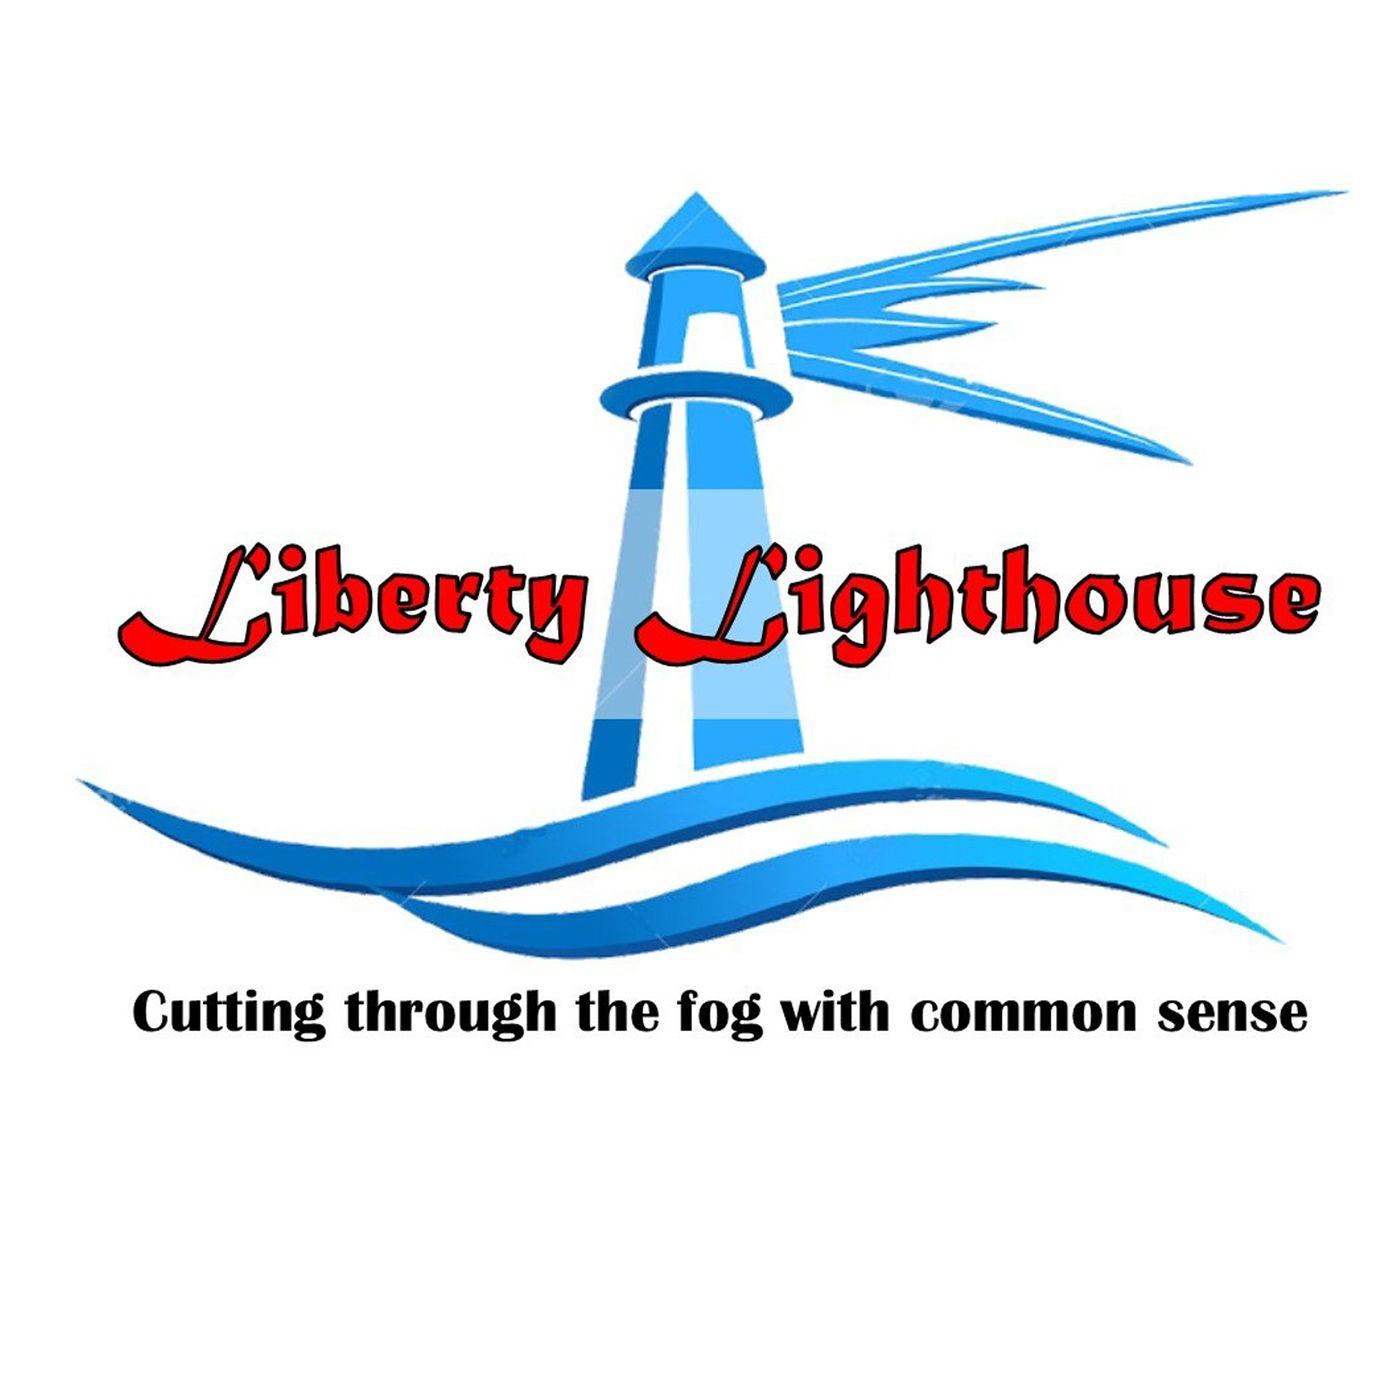 Liberty Lighthouse - 20210320